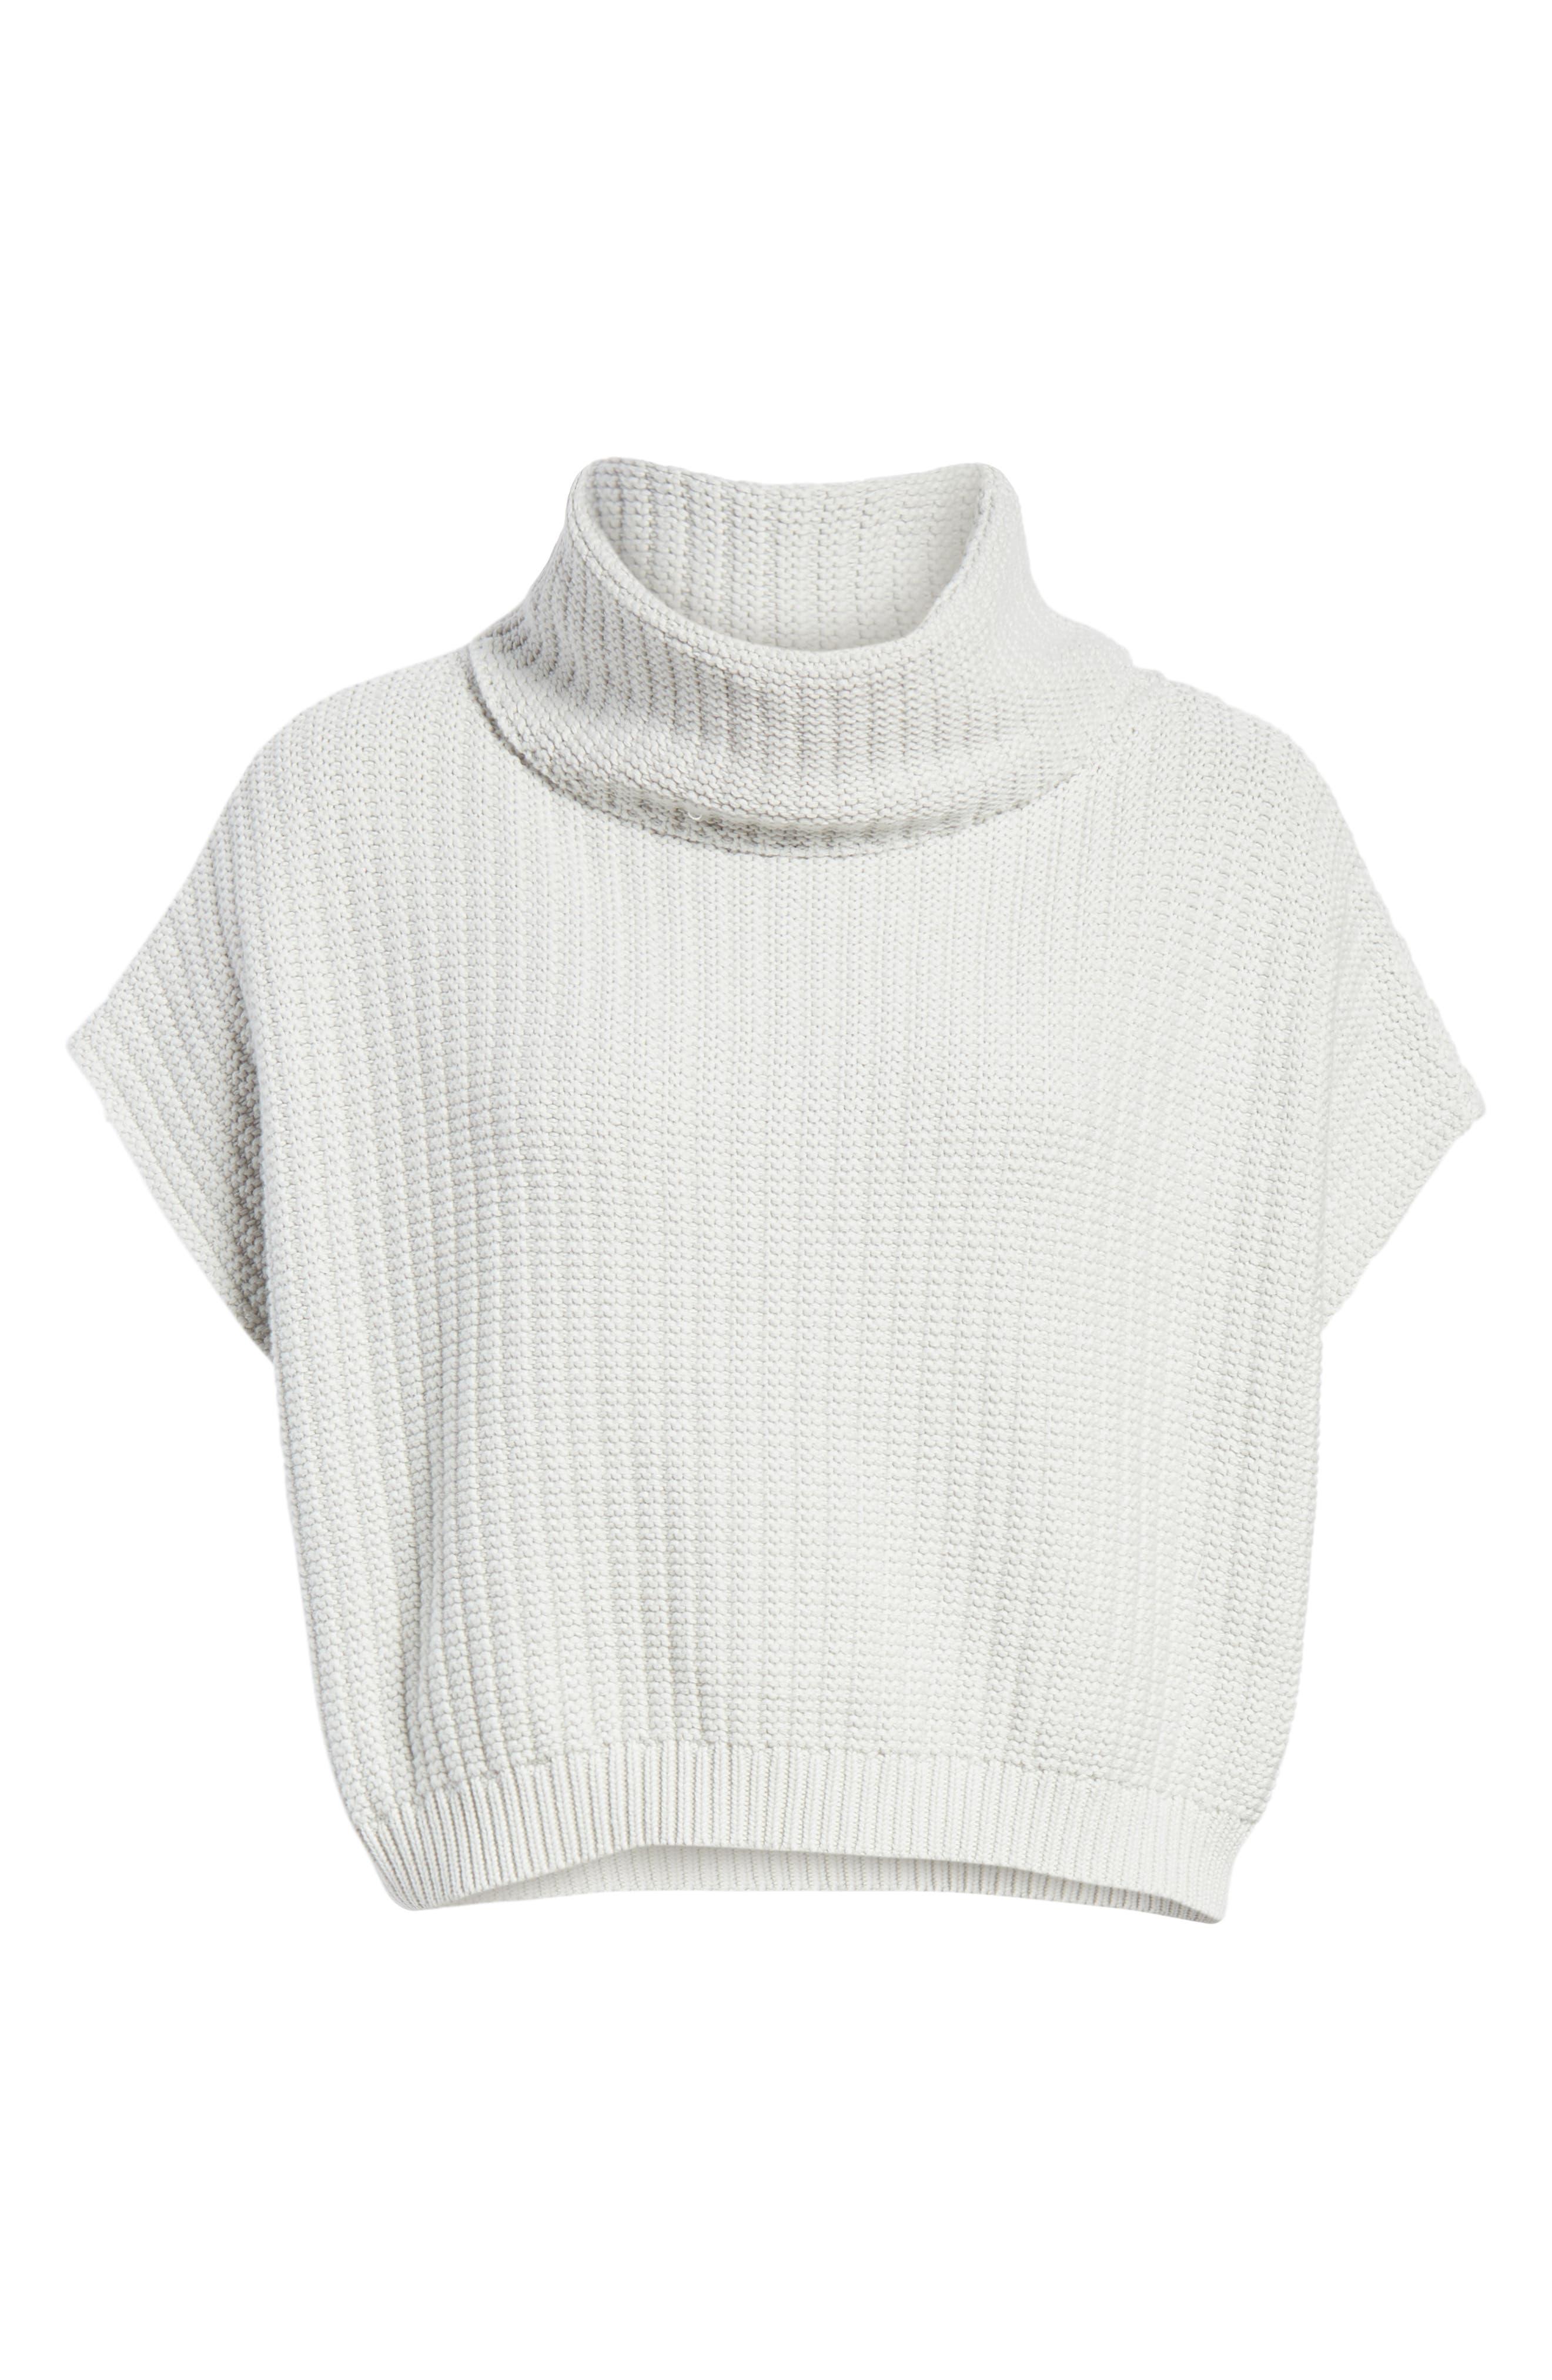 Keep It Simple Vest,                             Alternate thumbnail 6, color,                             Light Grey